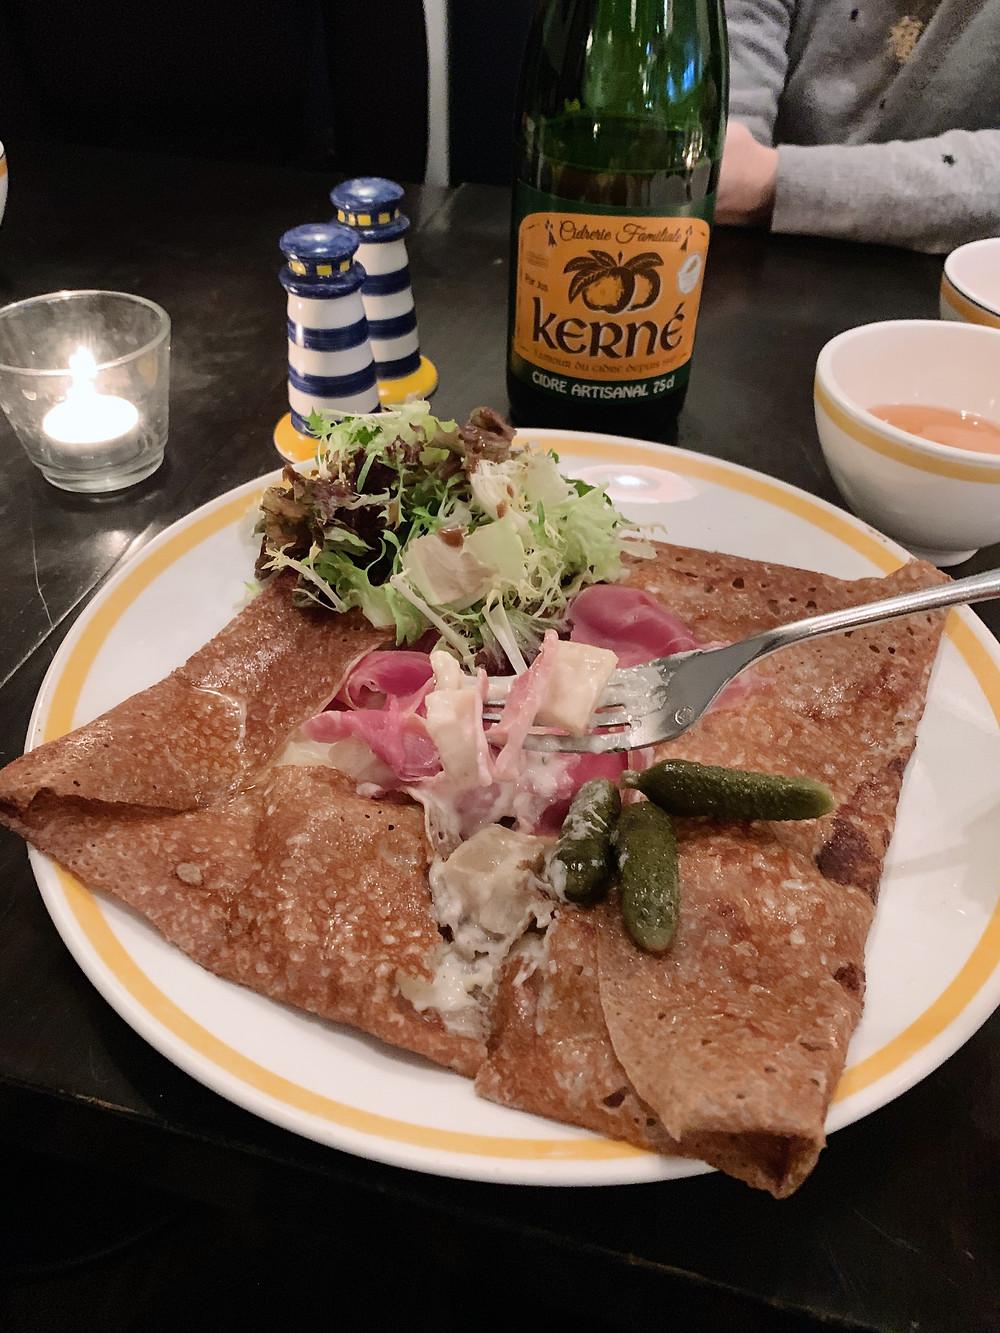 Food at La Creperie restaurant in Hong Kong